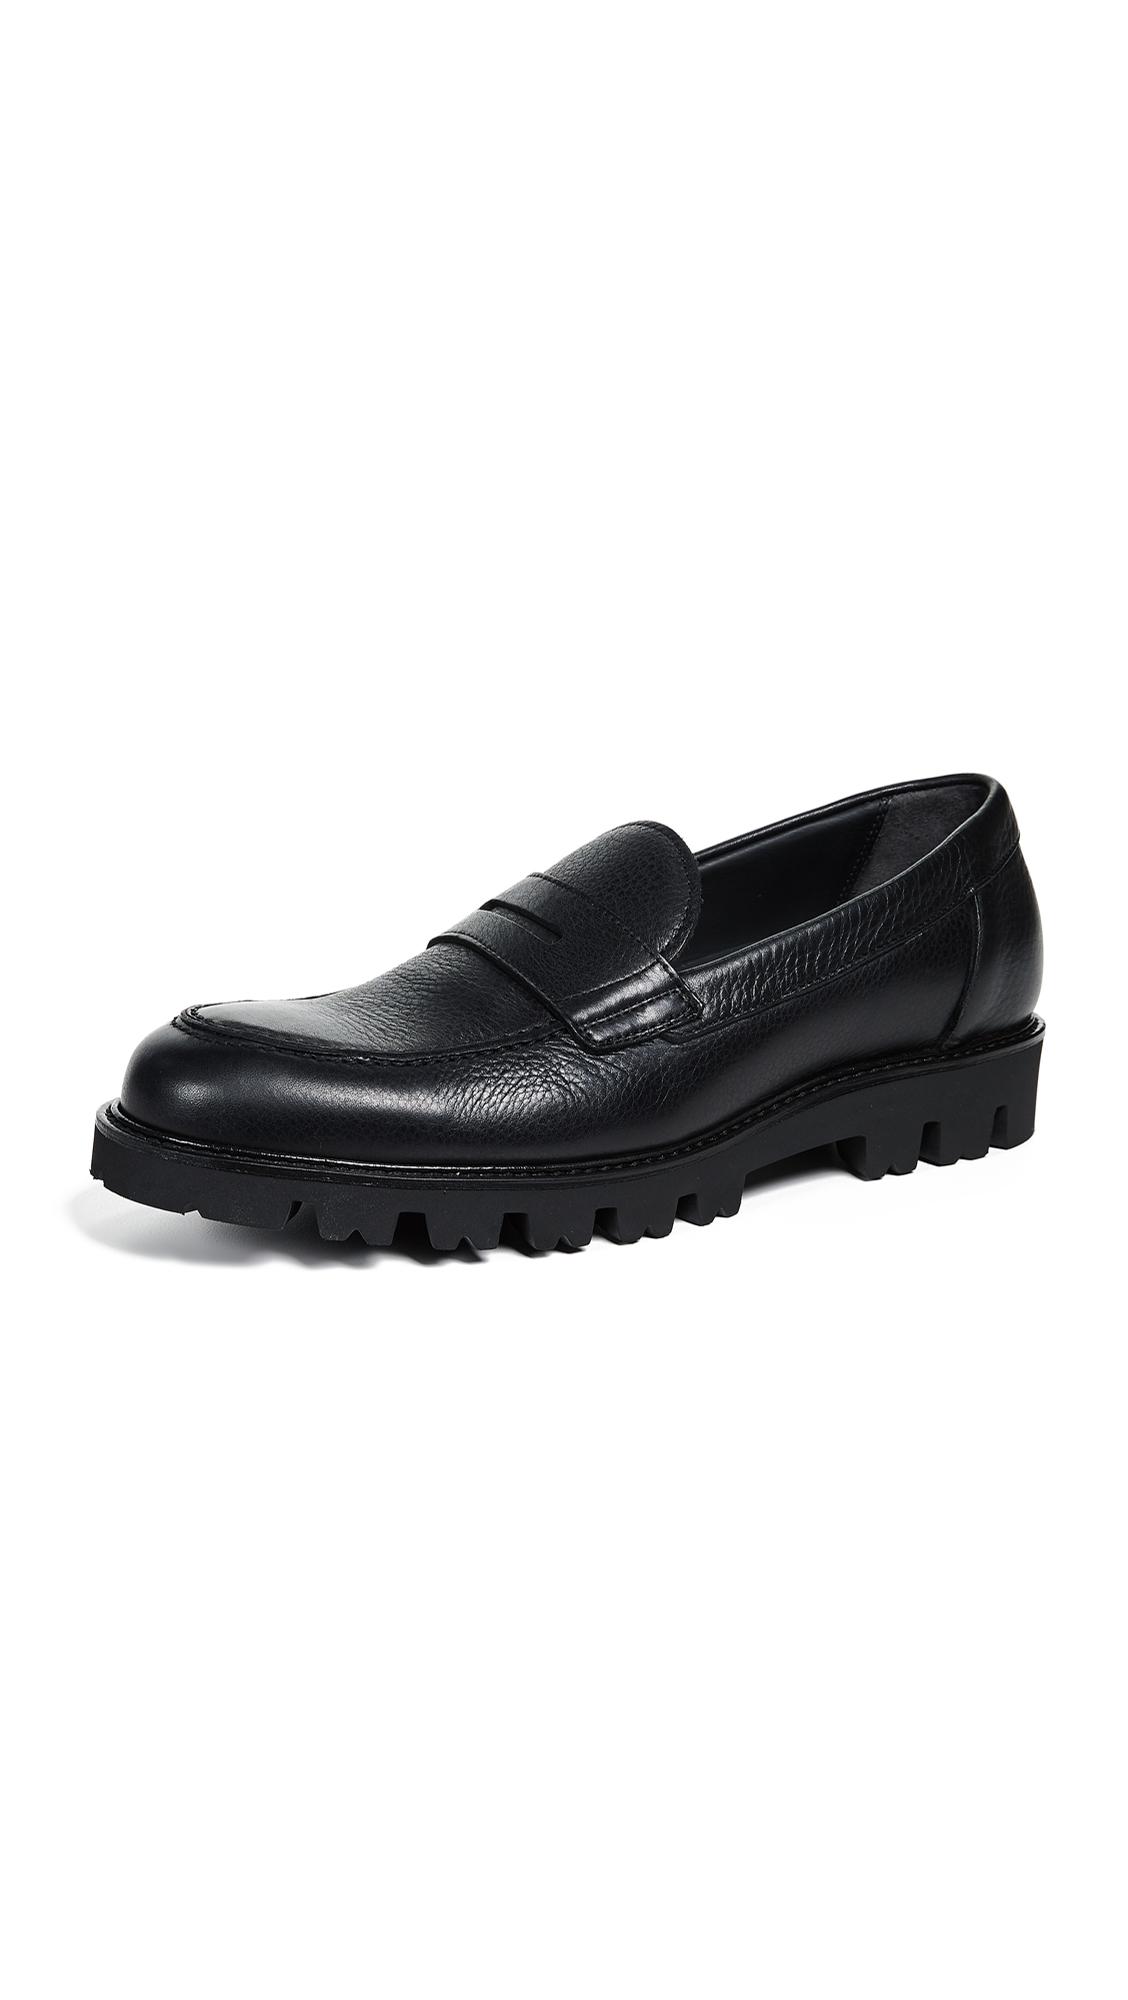 Men'S Comrade Leather Lug-Sole Loafer in Black